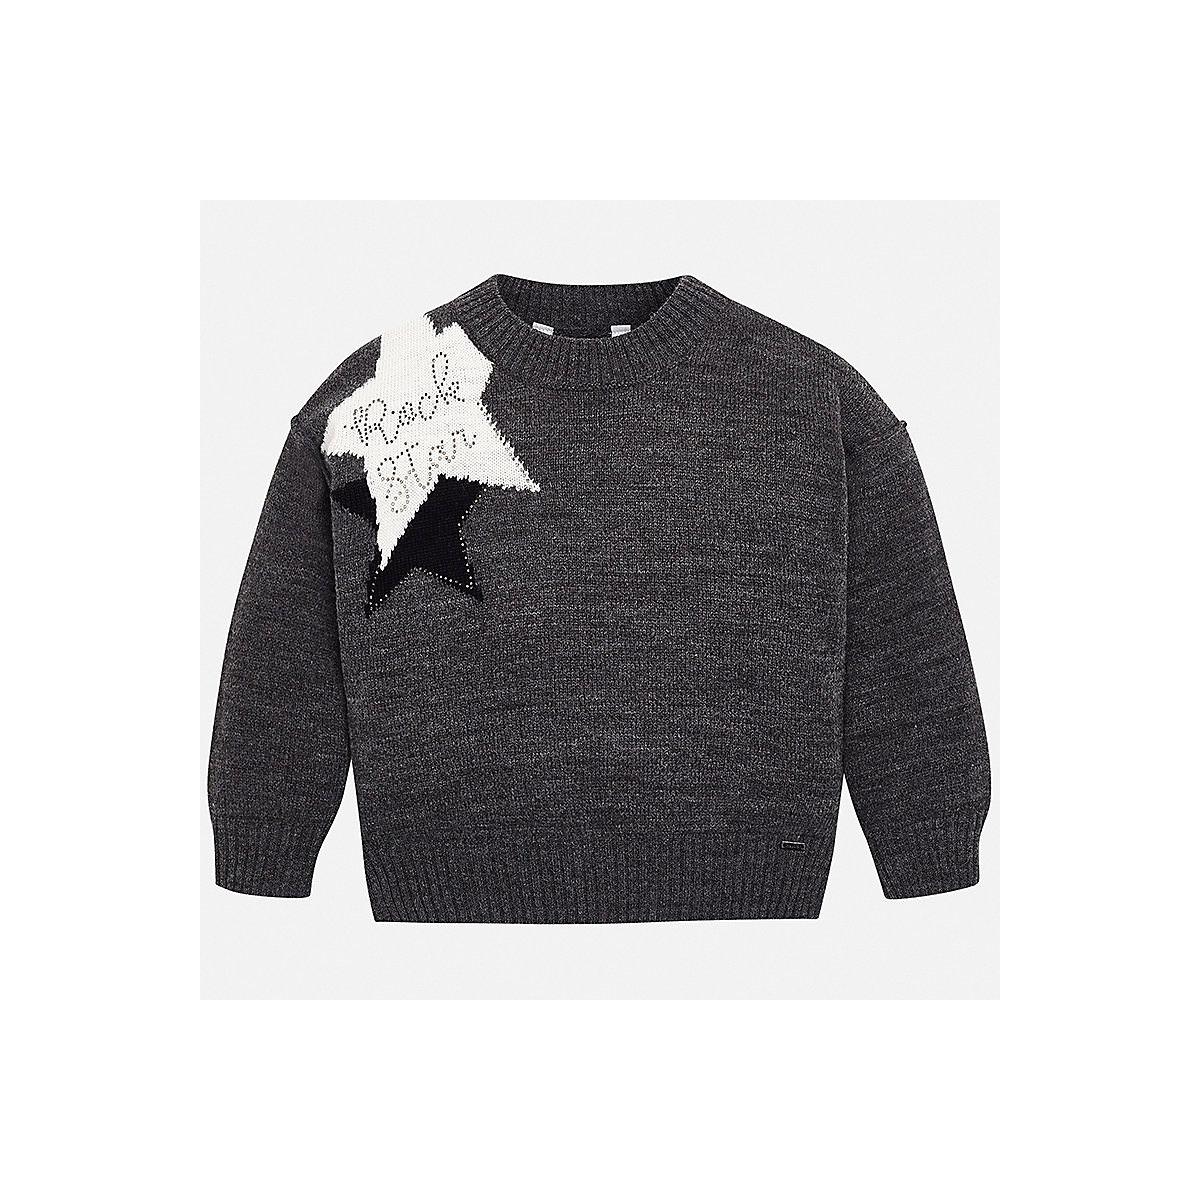 MAYORAL Sweaters 8850515 Girls Acrylic winter clothes baby wear boy children child wear